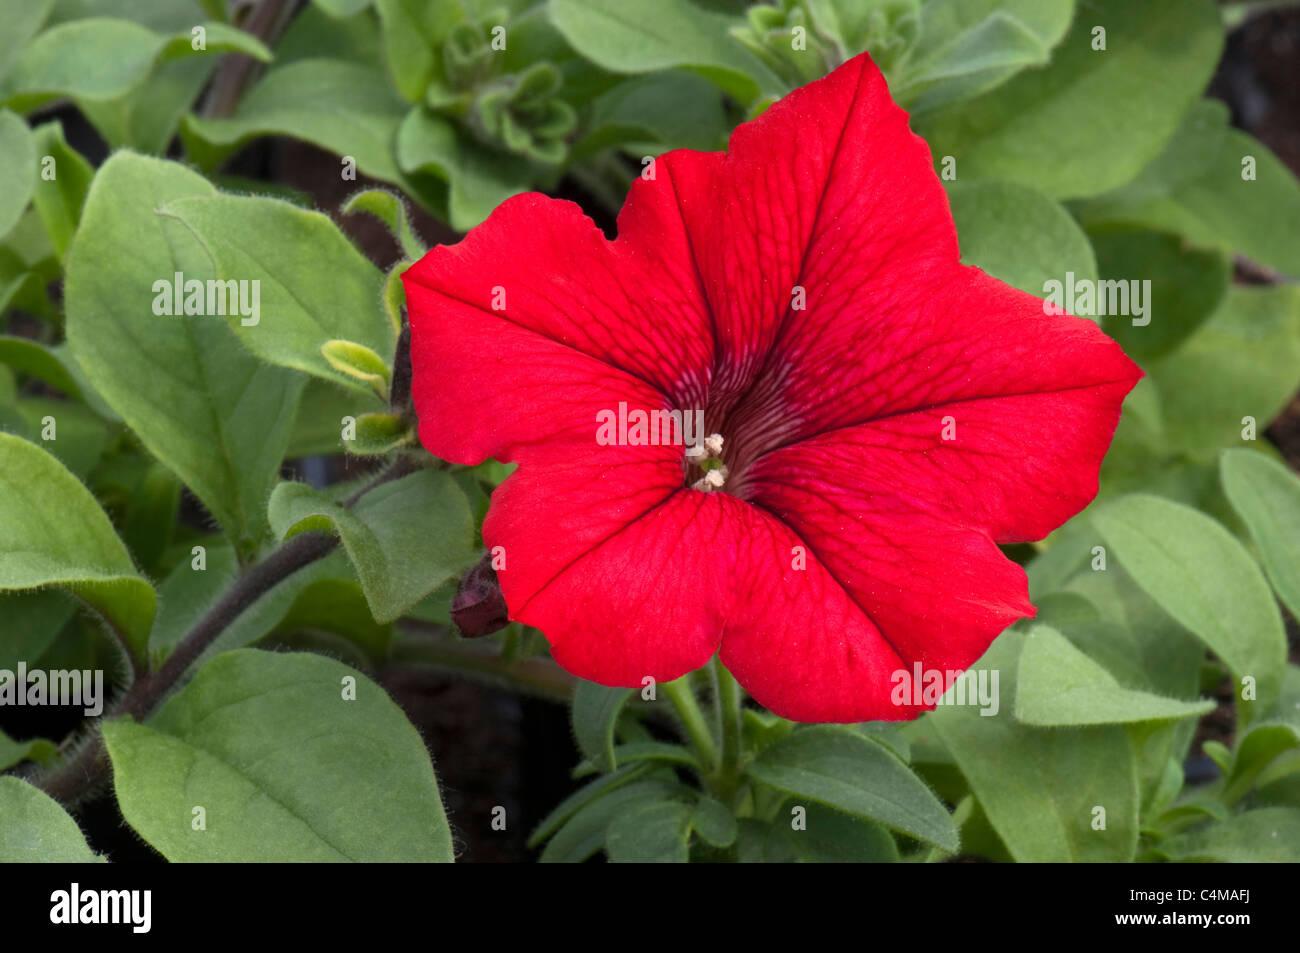 Garden Petunia (Petunia x hybrida), red flower. - Stock Image